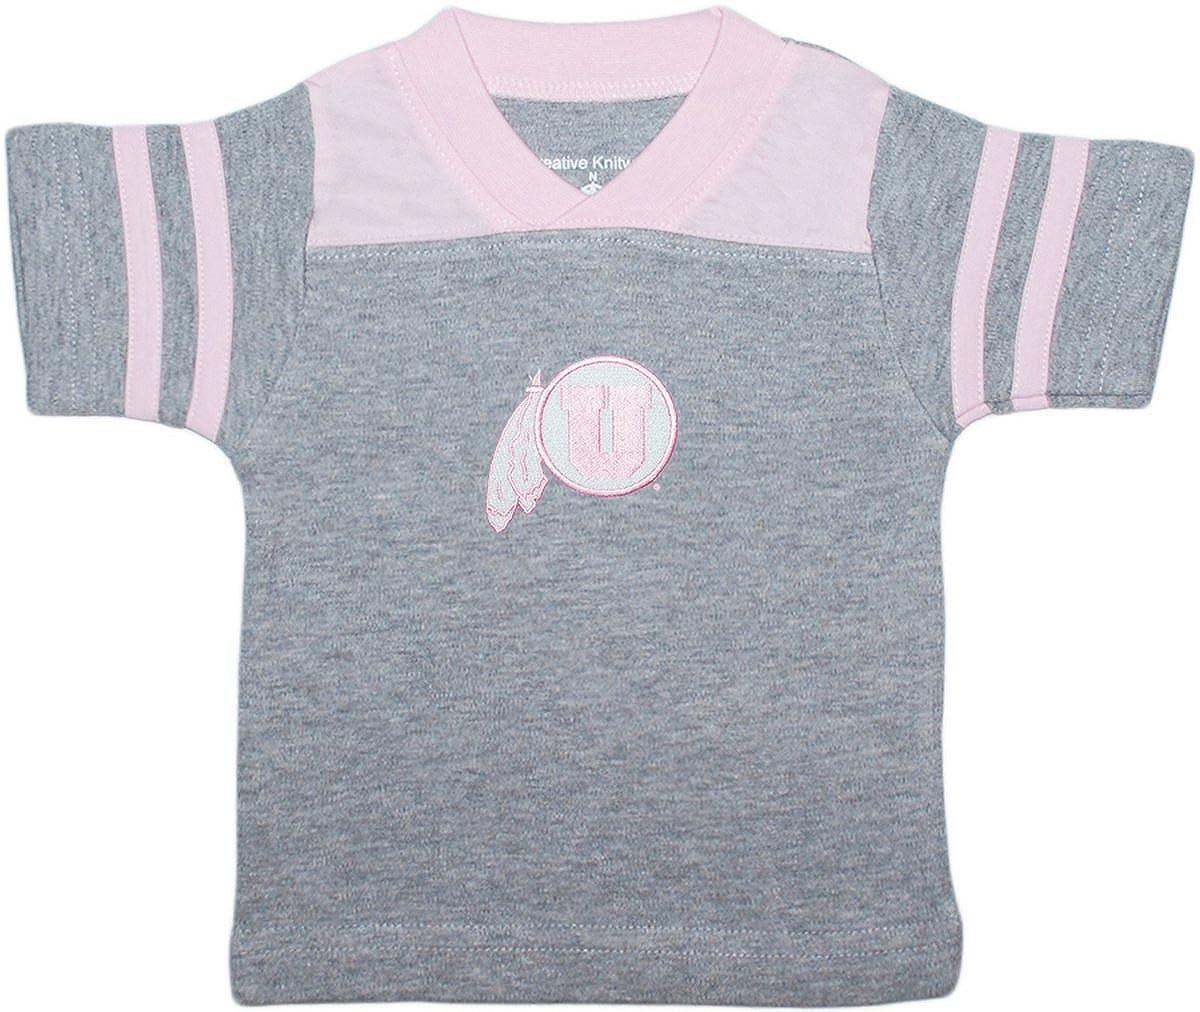 Creative Knitwear University of Utah Baby Sport Shirt